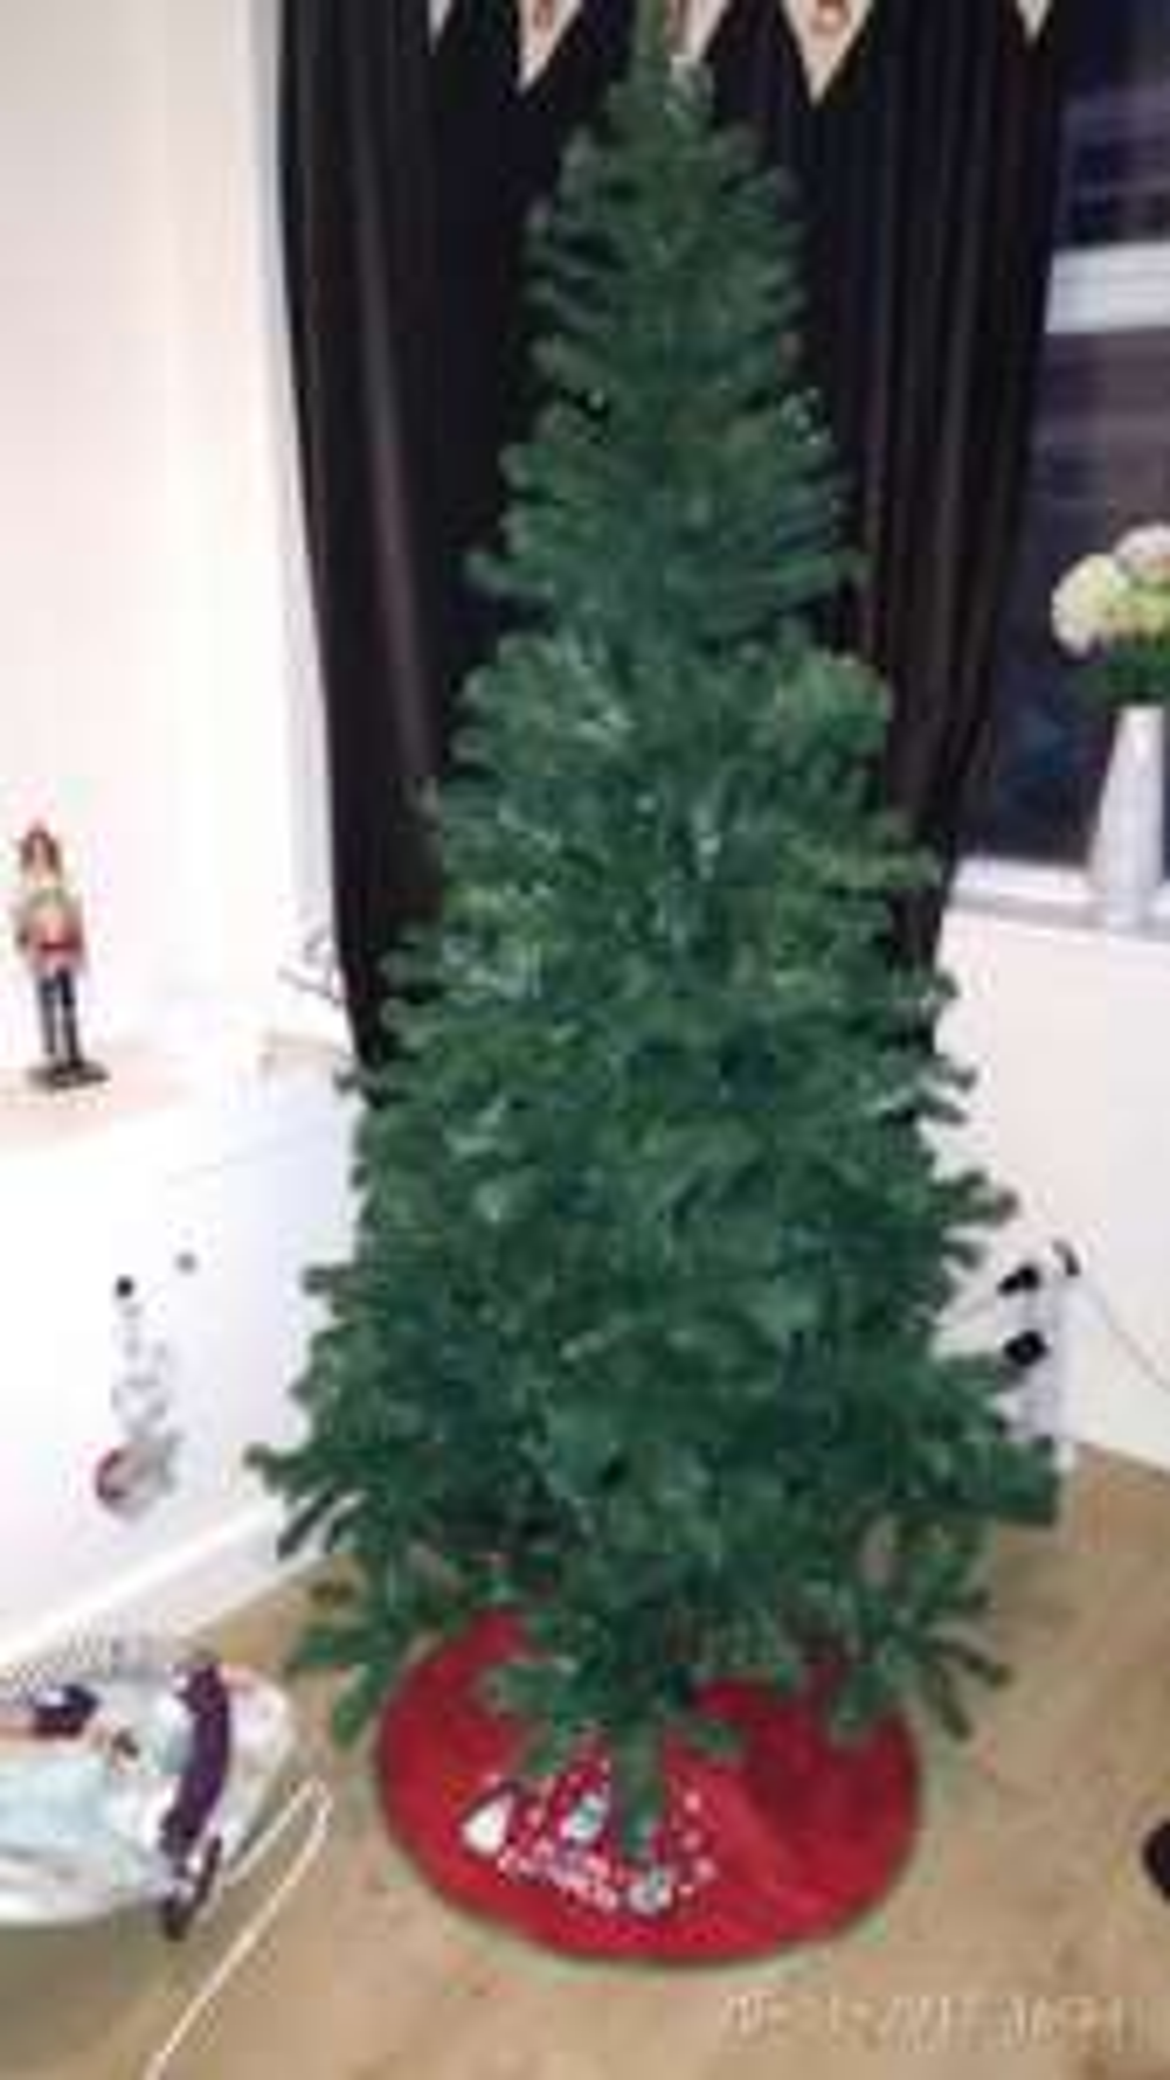 B & Q 7ft tree - £20 instore